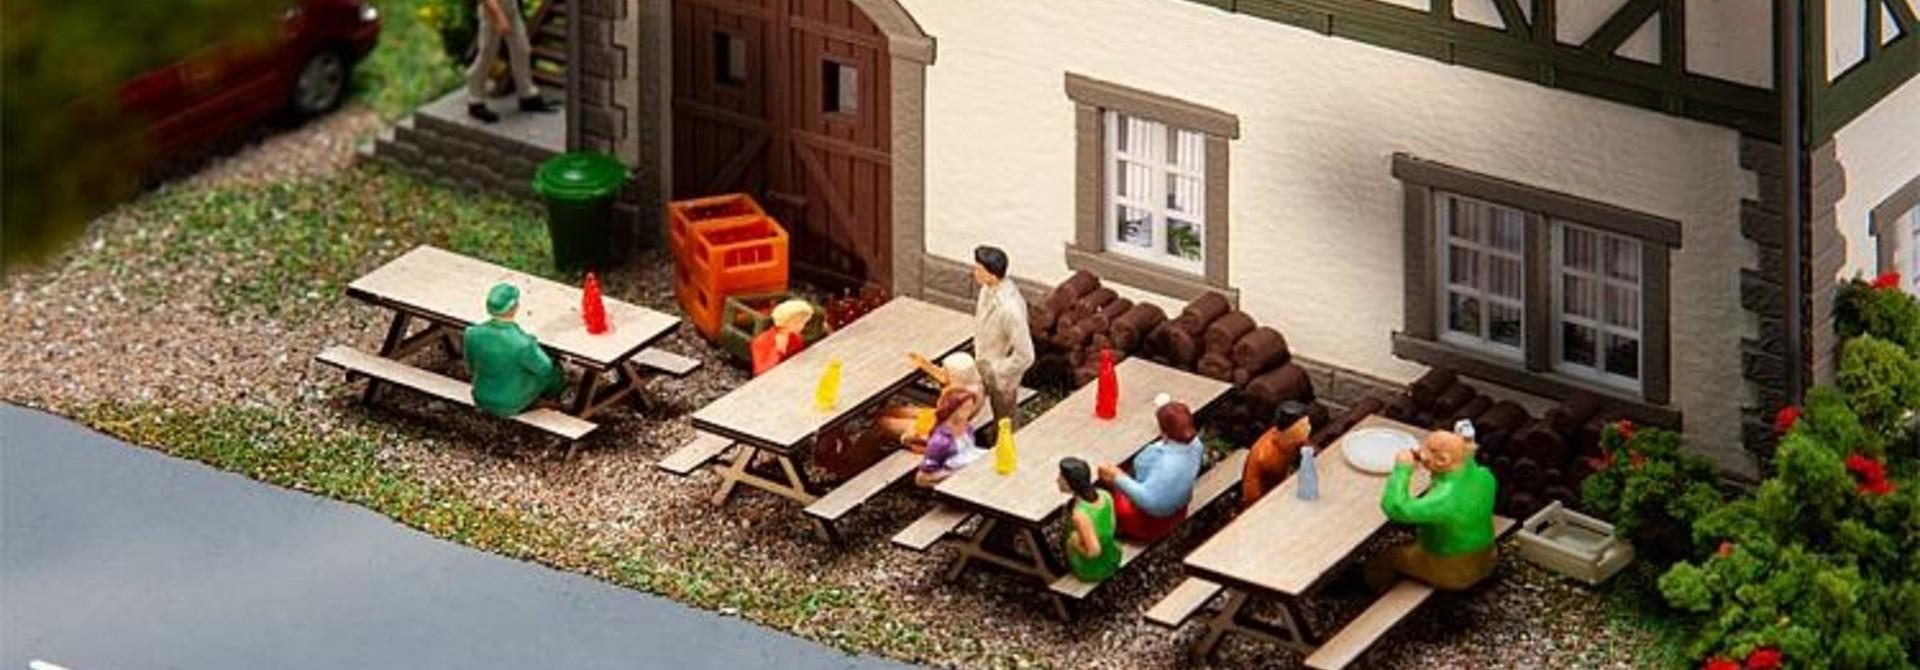 180304 4 Picknickbänke